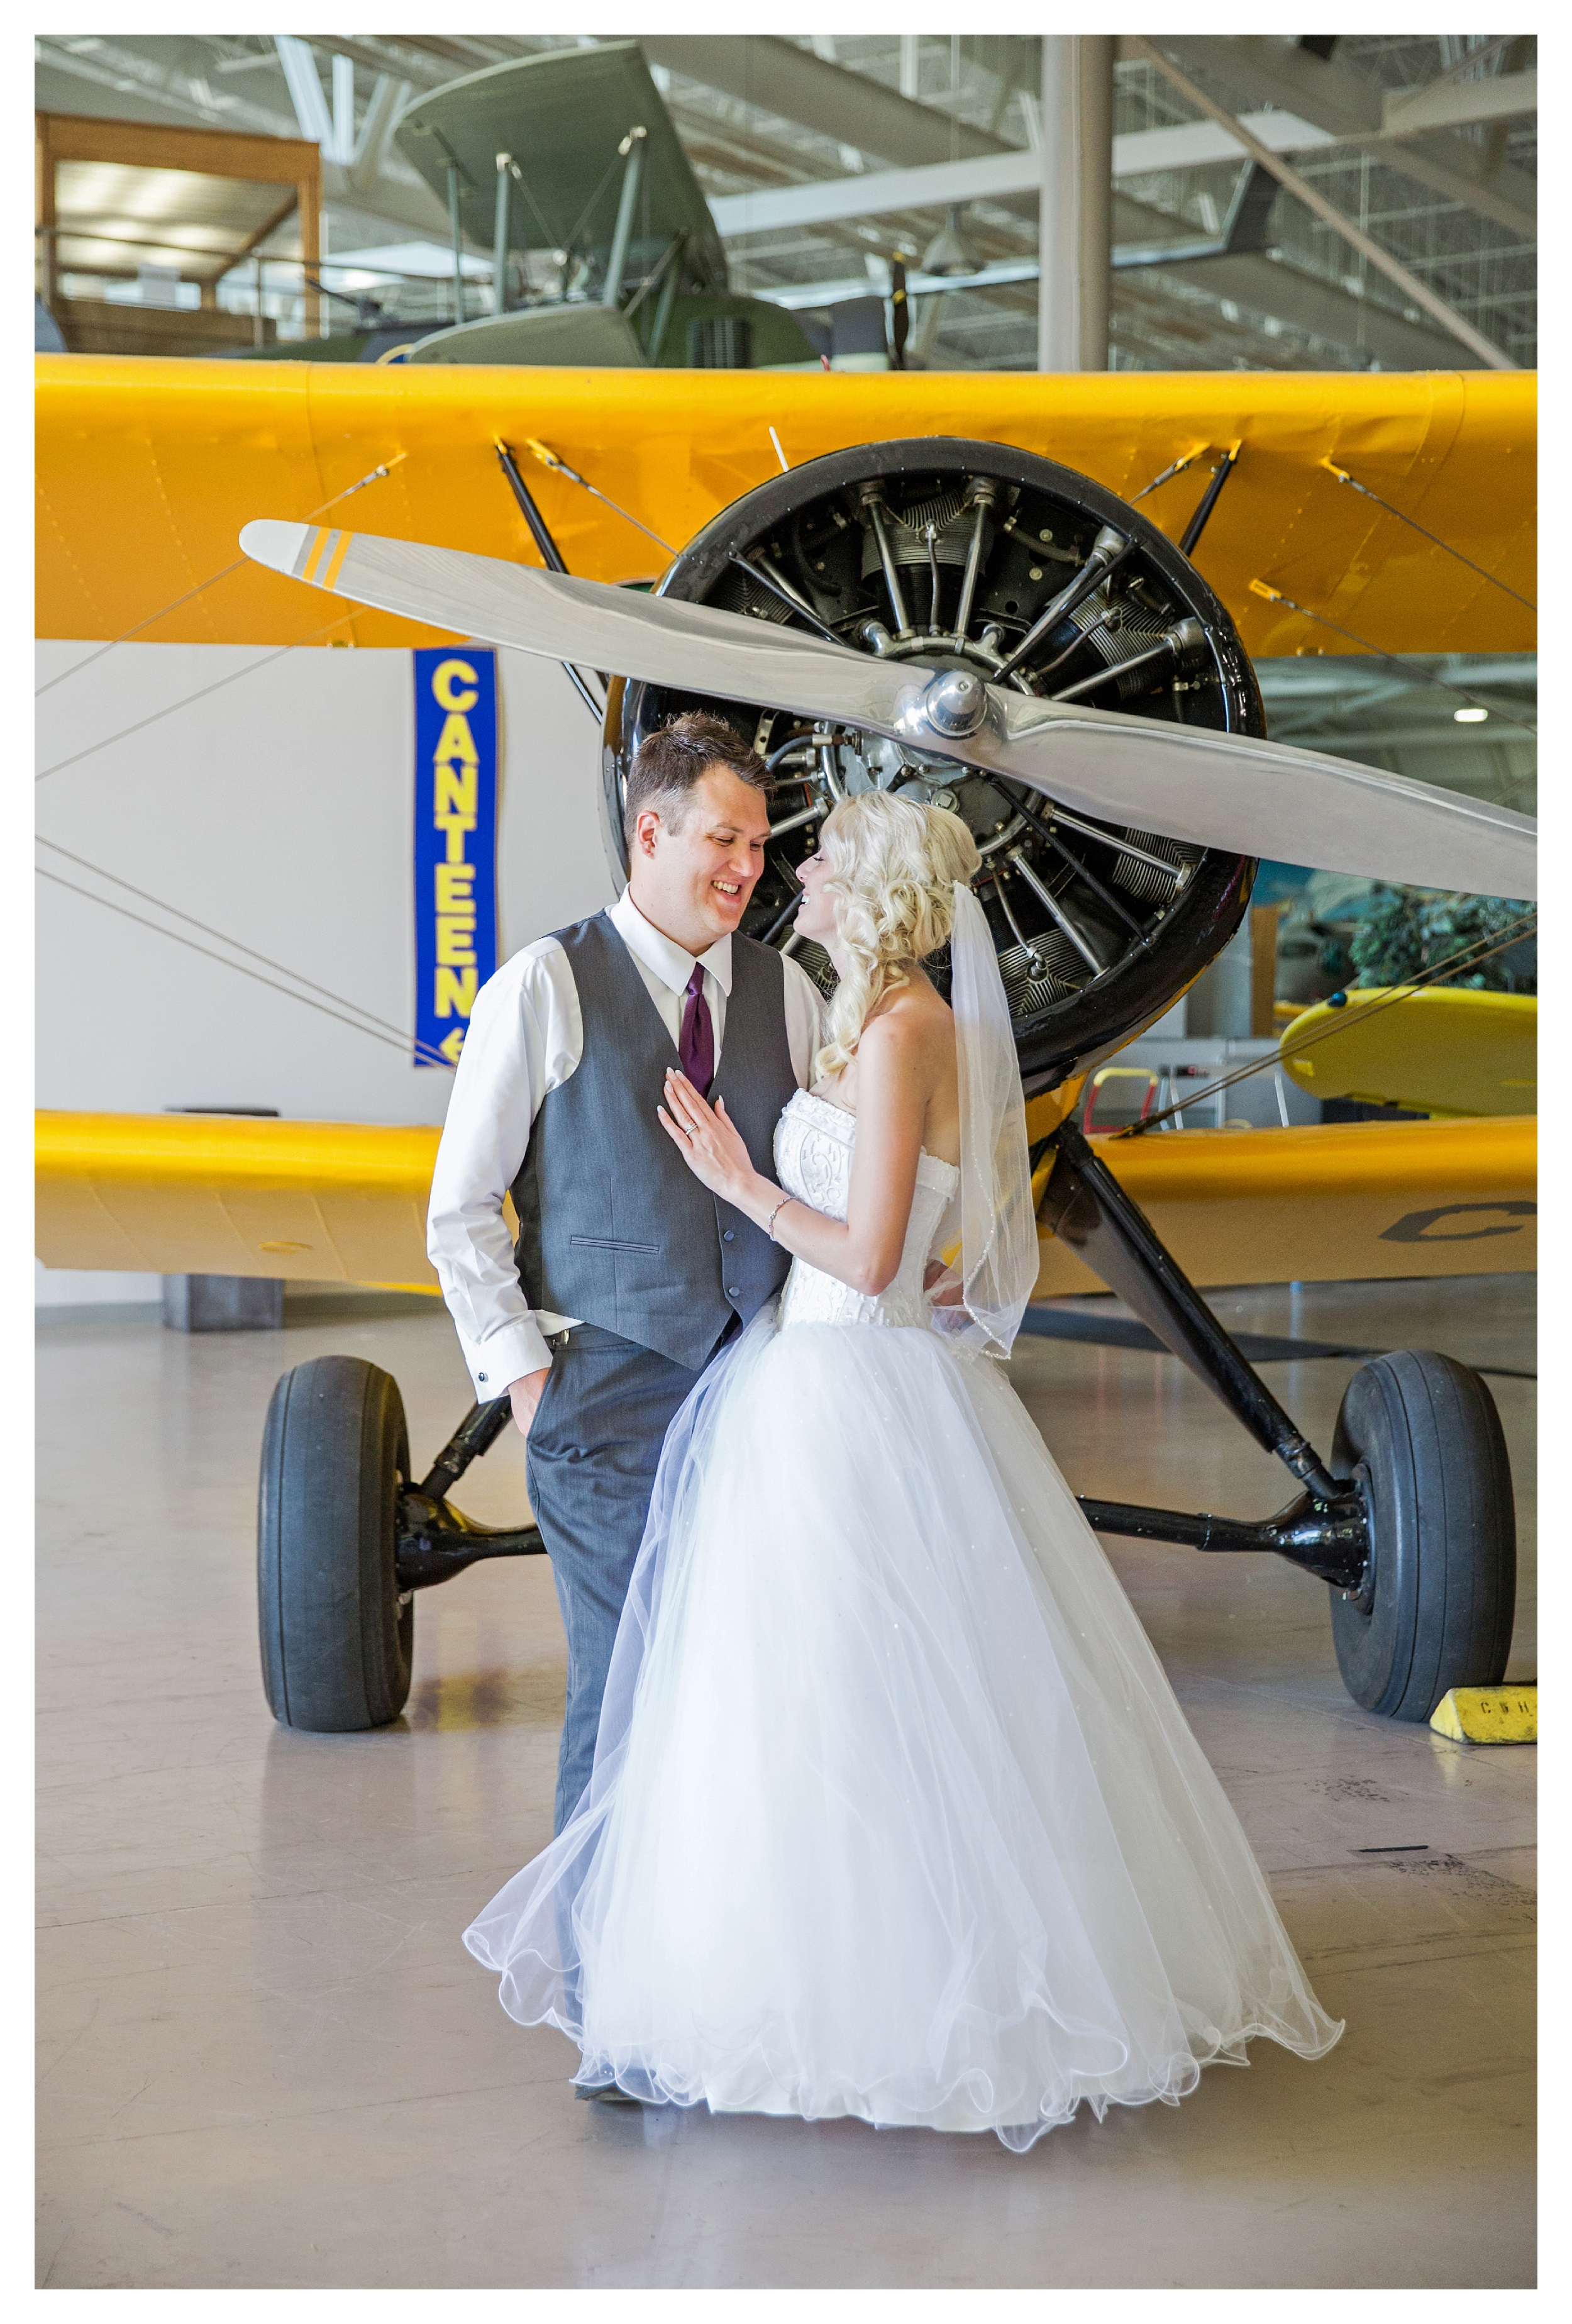 hamiltonwarplanemuseum-wedding_0044.jpg